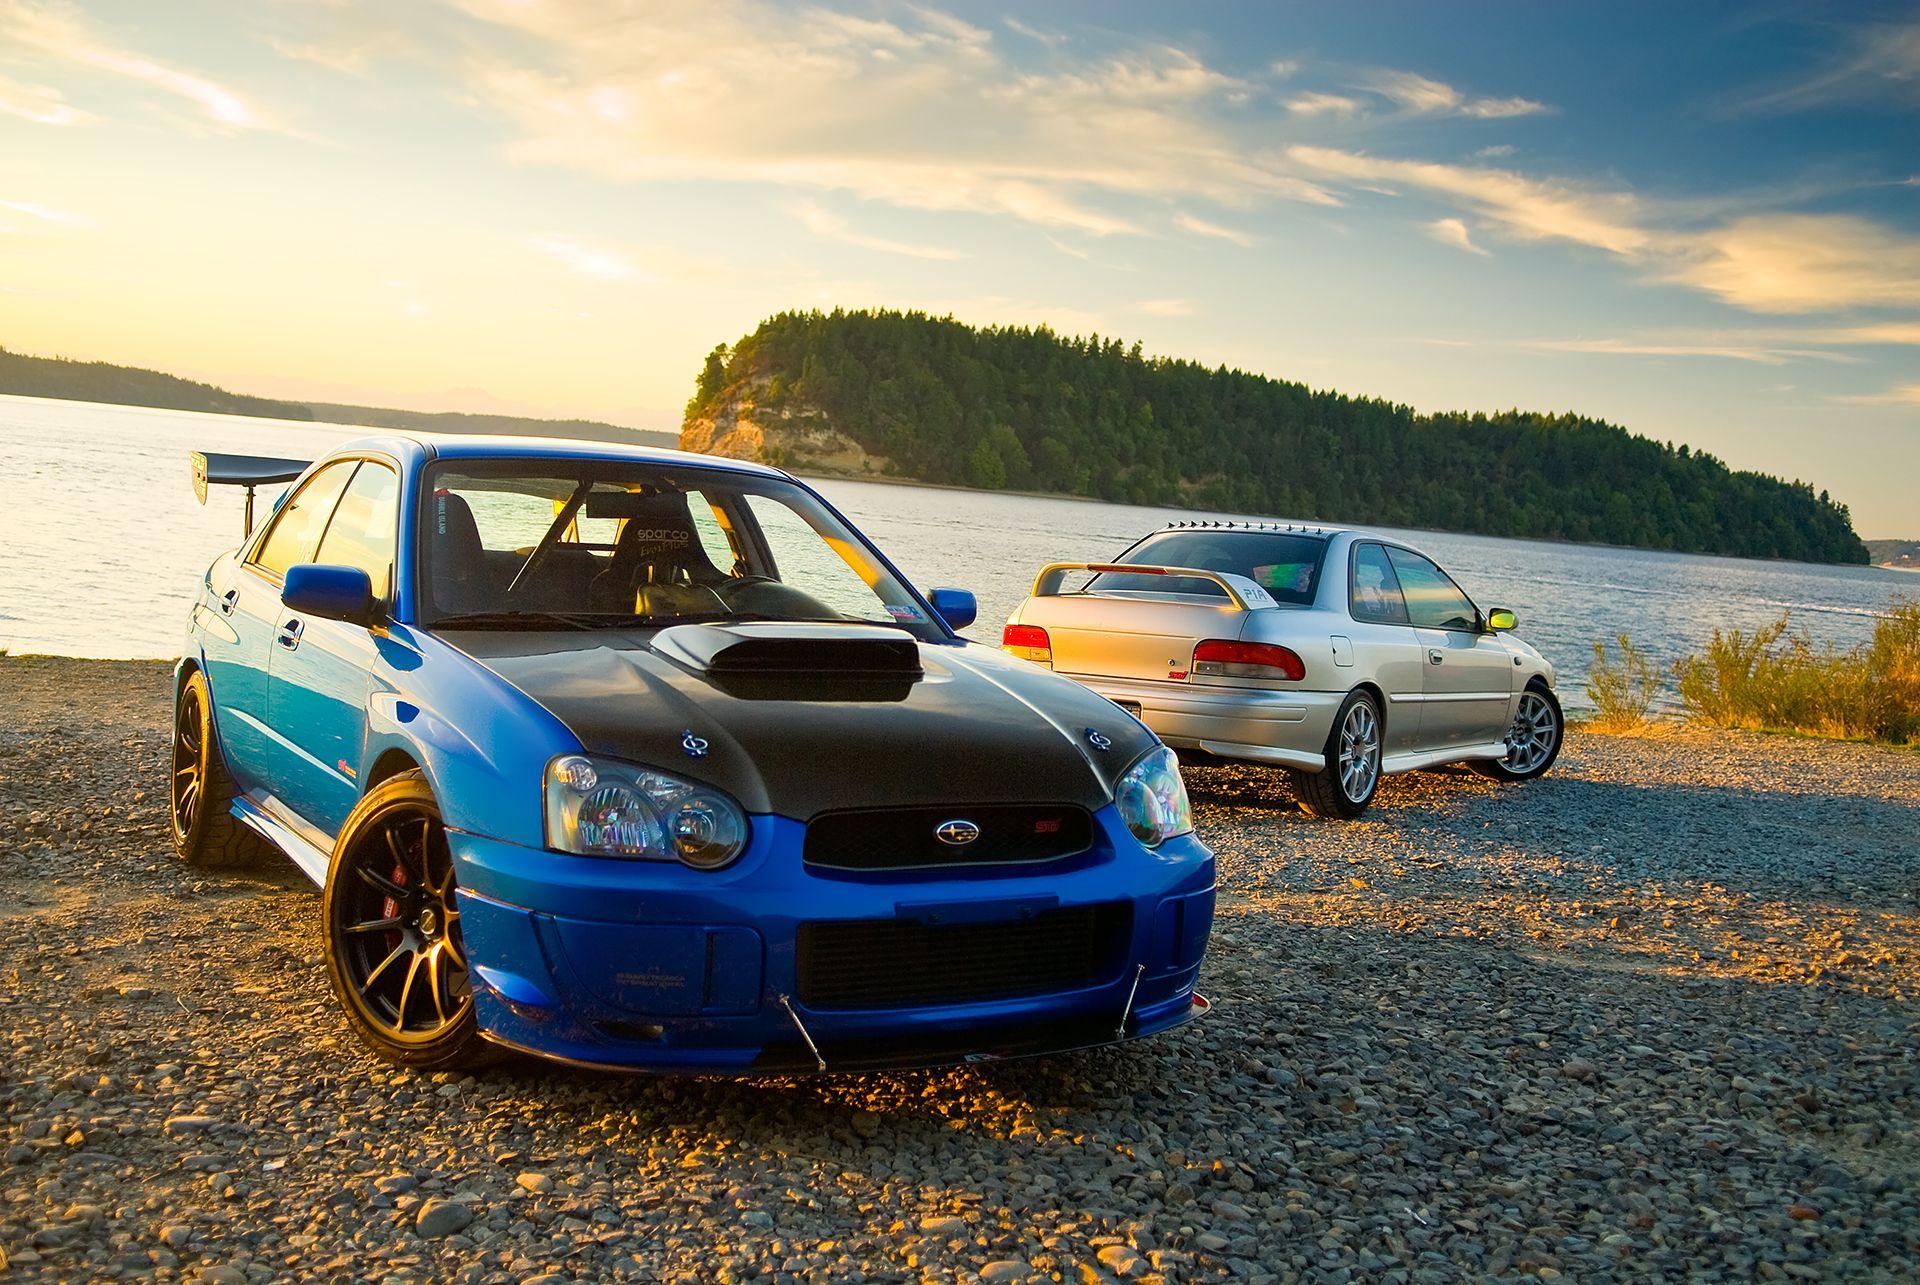 Subaru Impreza Wrx Sti Subaru Subaru Wrx Sti Subaru Wrx